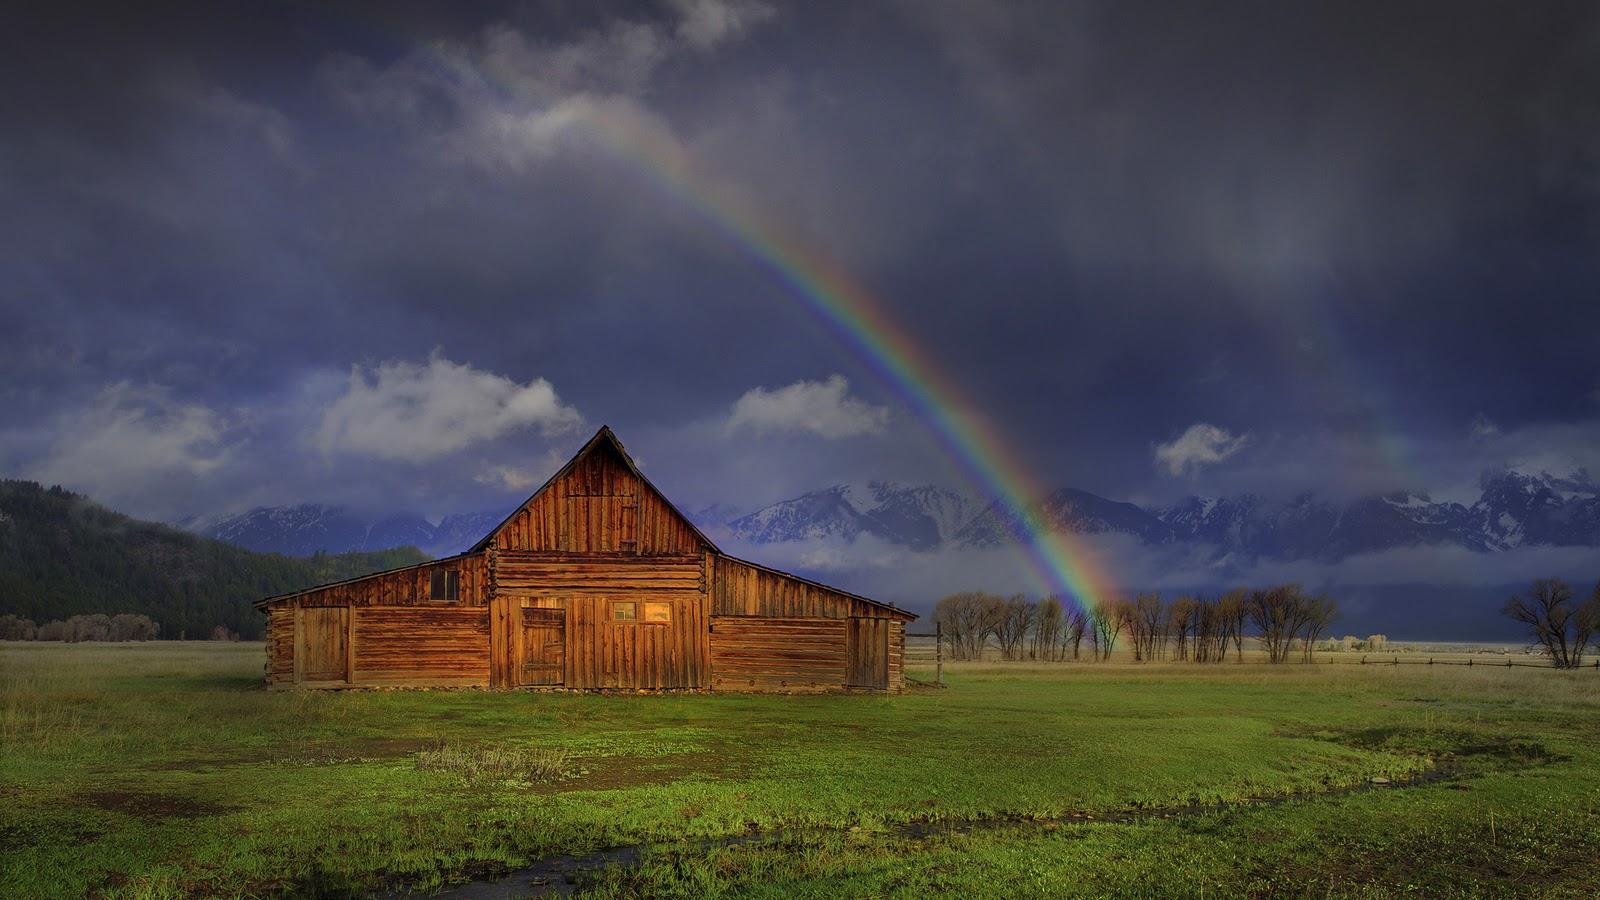 Funnnnnnny Walpaperz Beautiful Rainbows And Lightnings